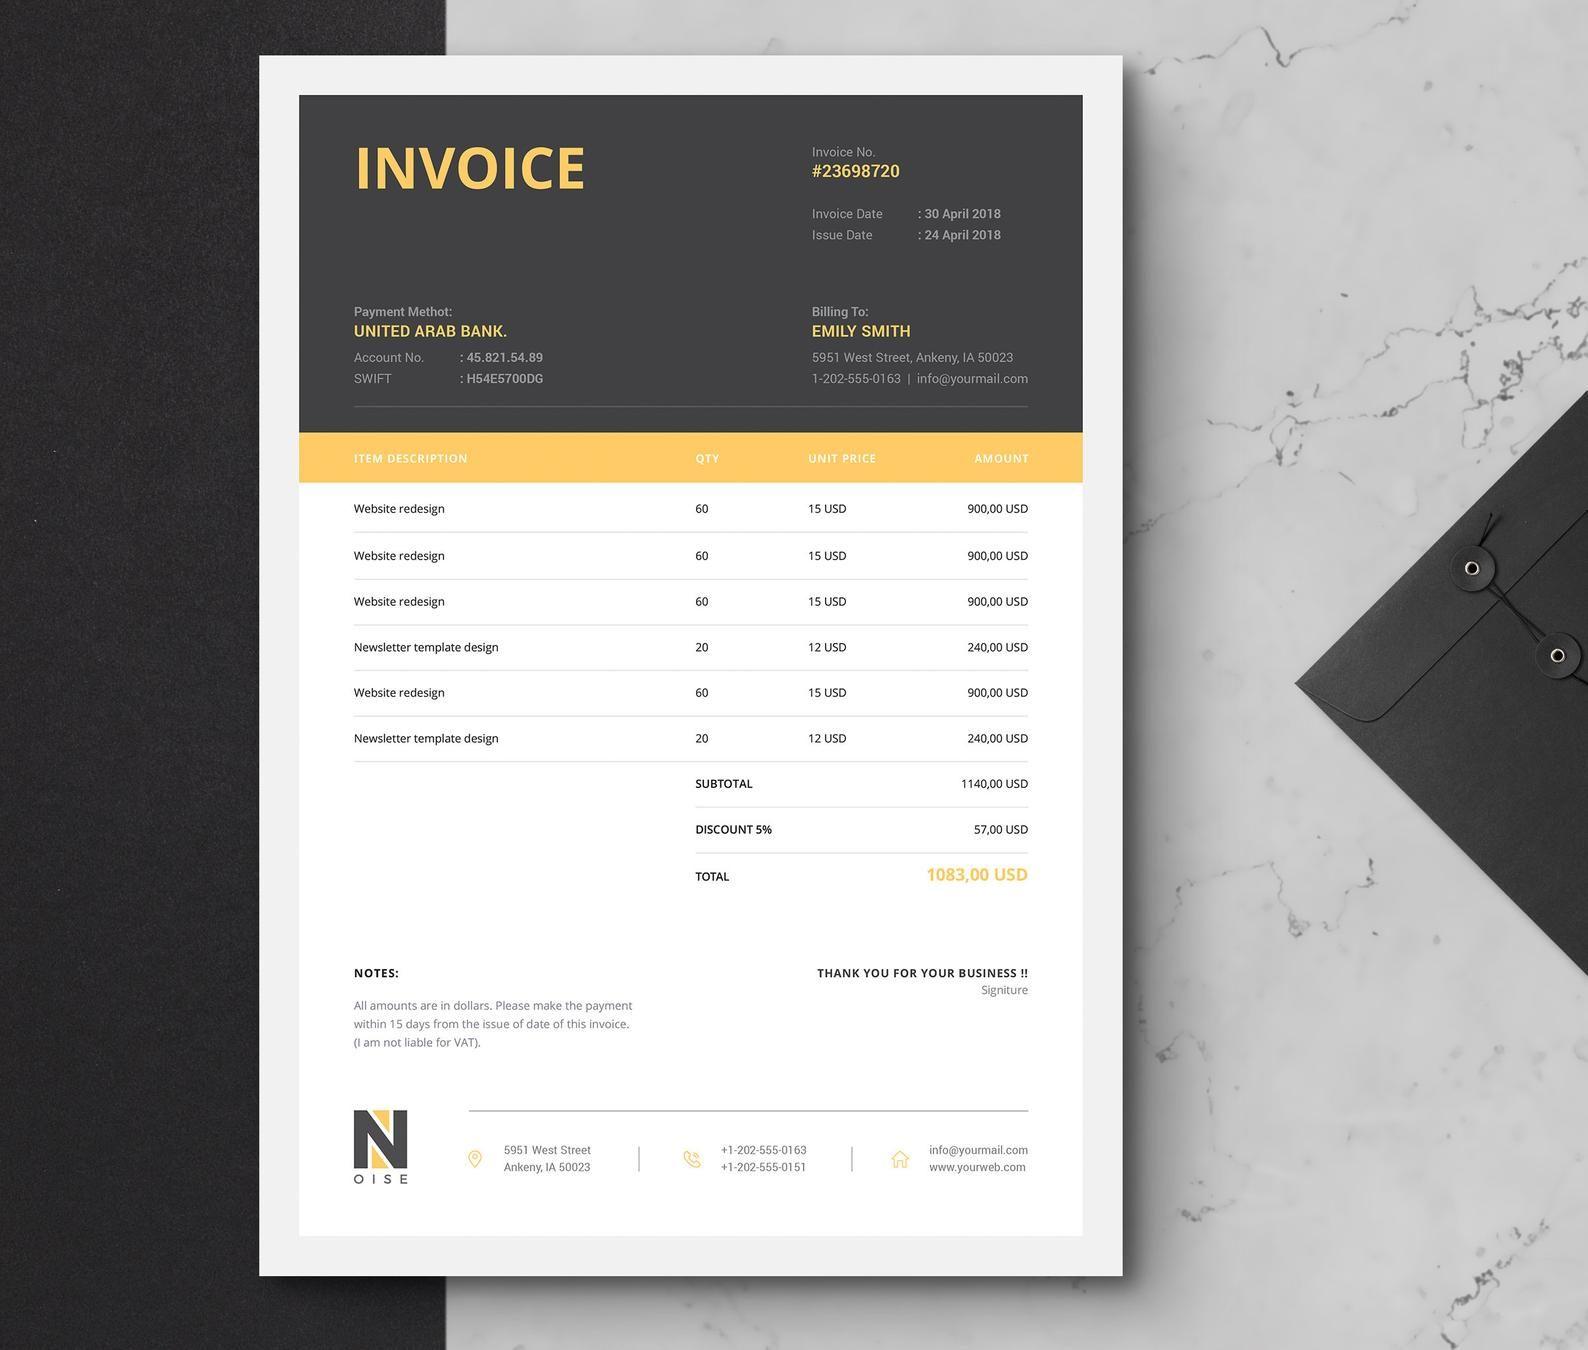 Invoice Template Business Invoice Receipt Printable Etsy Invoice Template Invoice Design Invoice Design Template